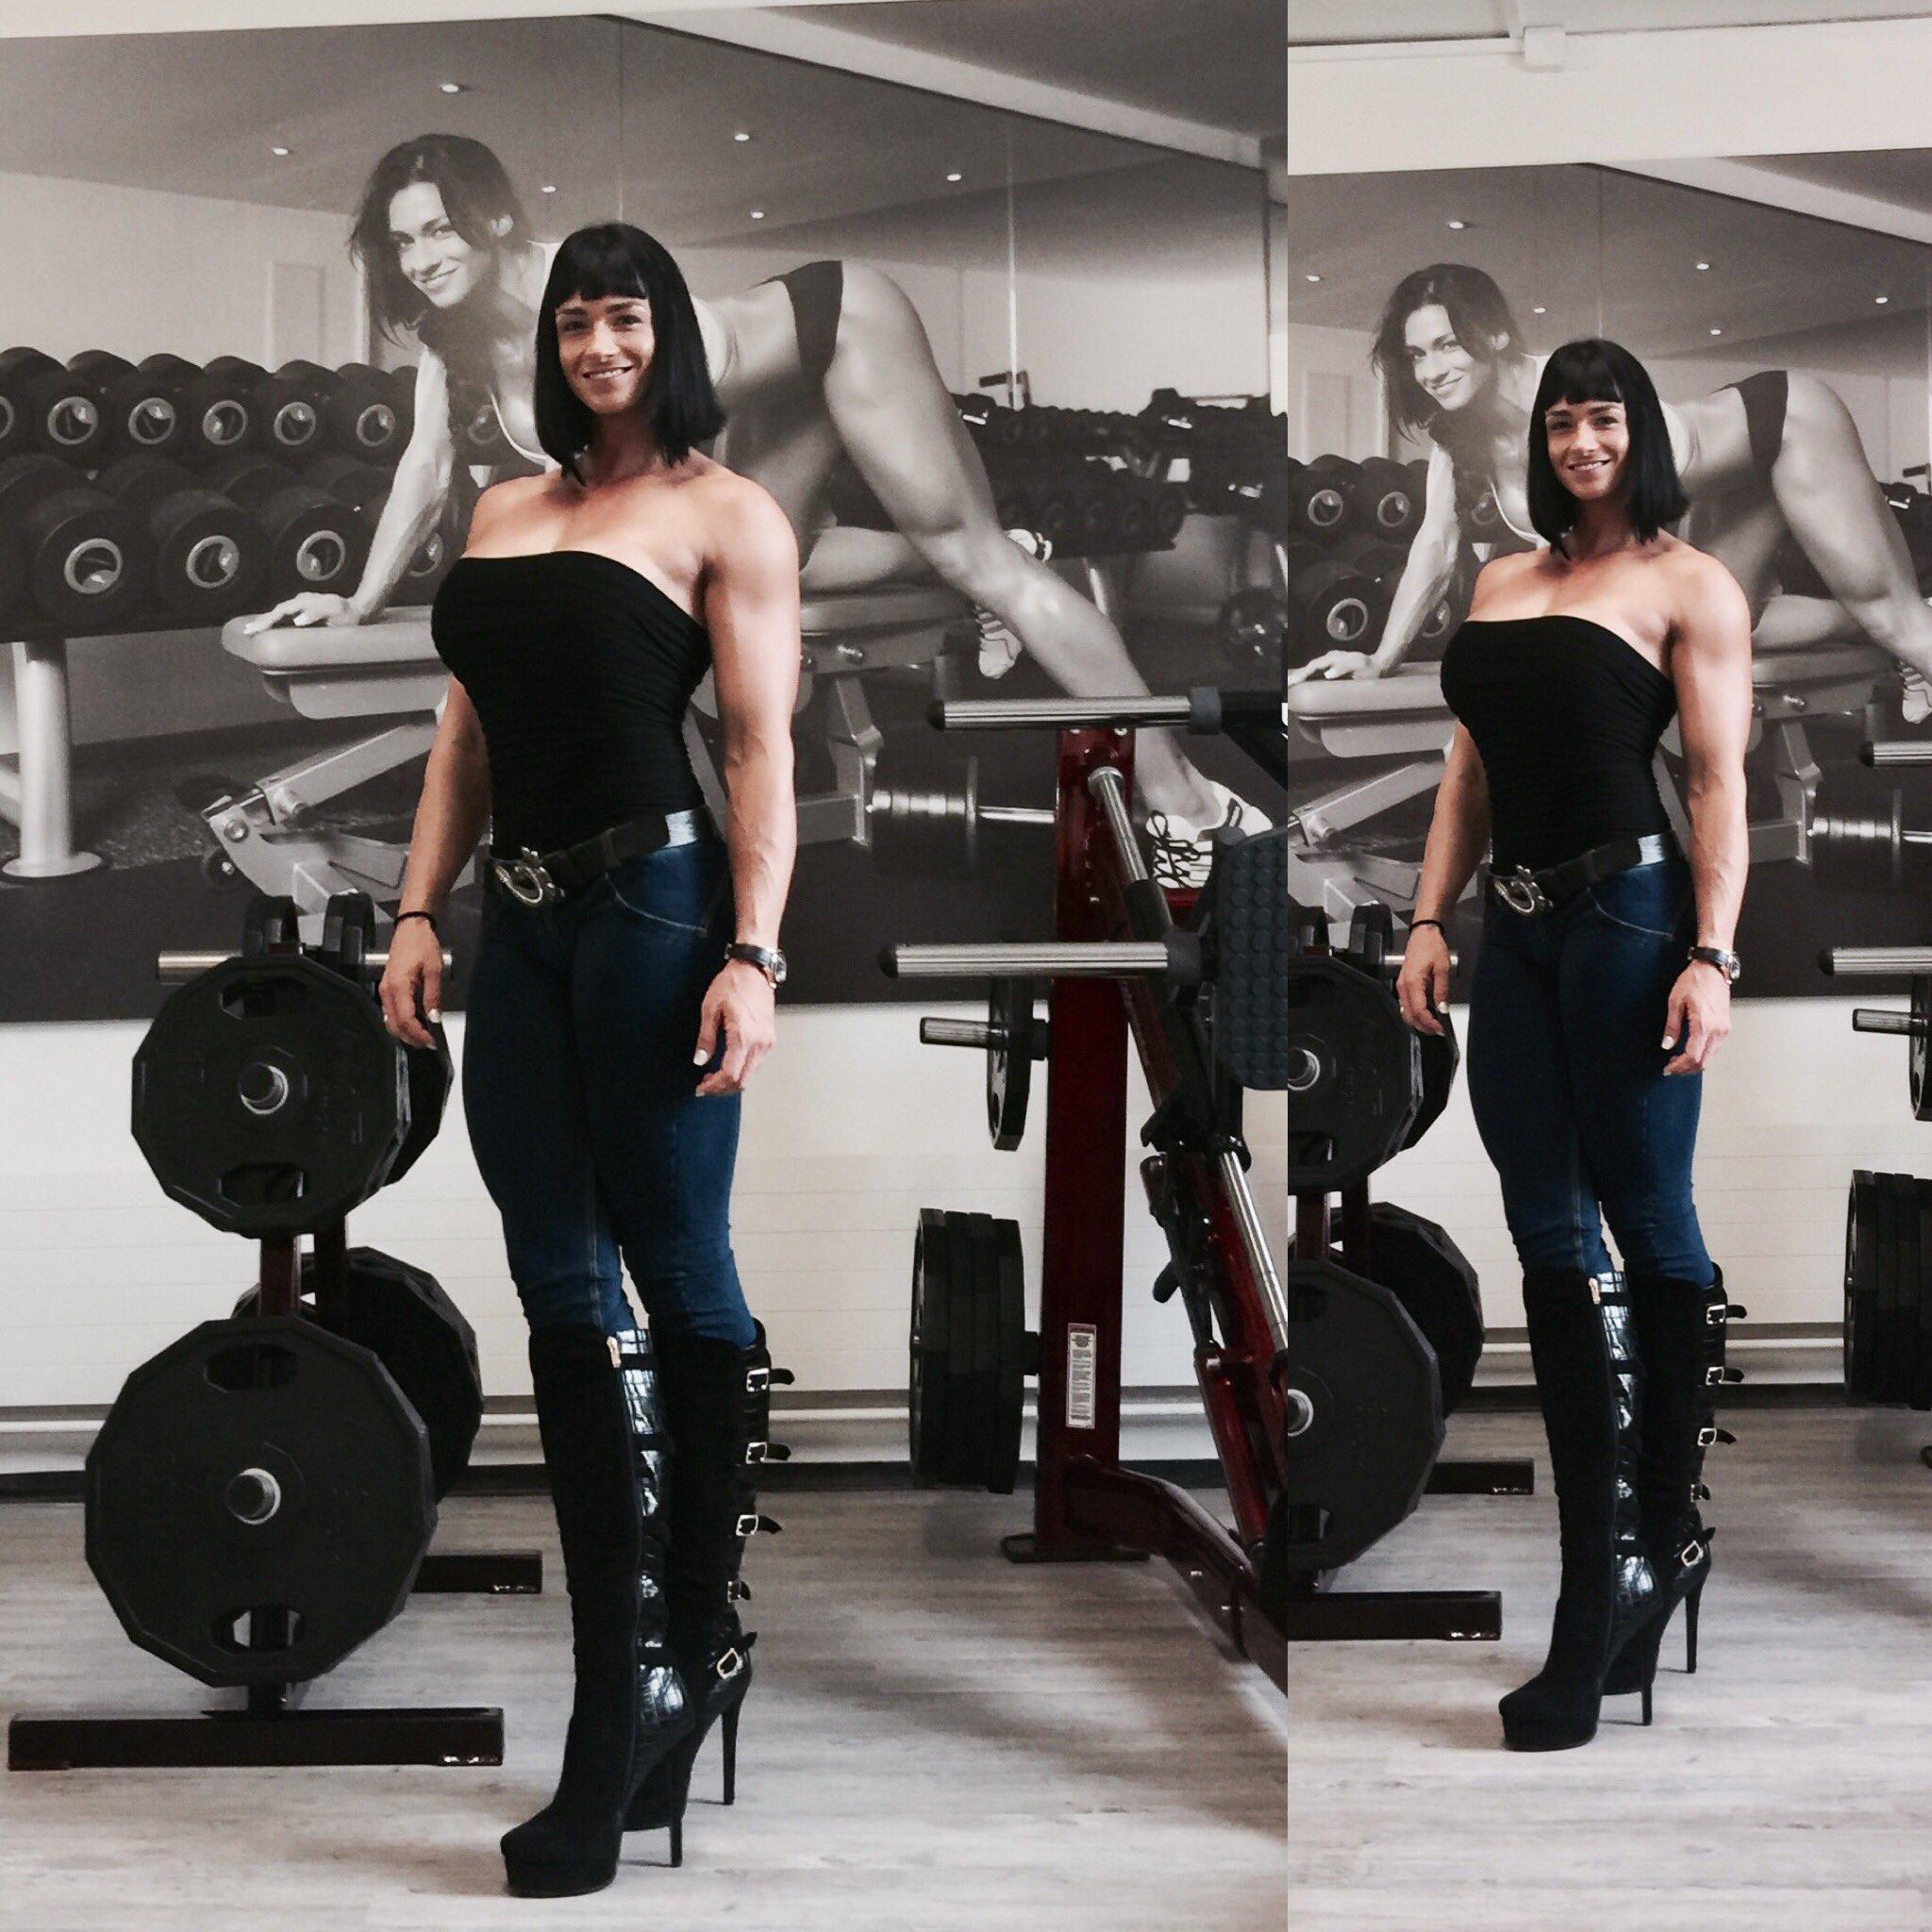 cindy landolt on twitter   u0026quot fitnesslife24 opening today